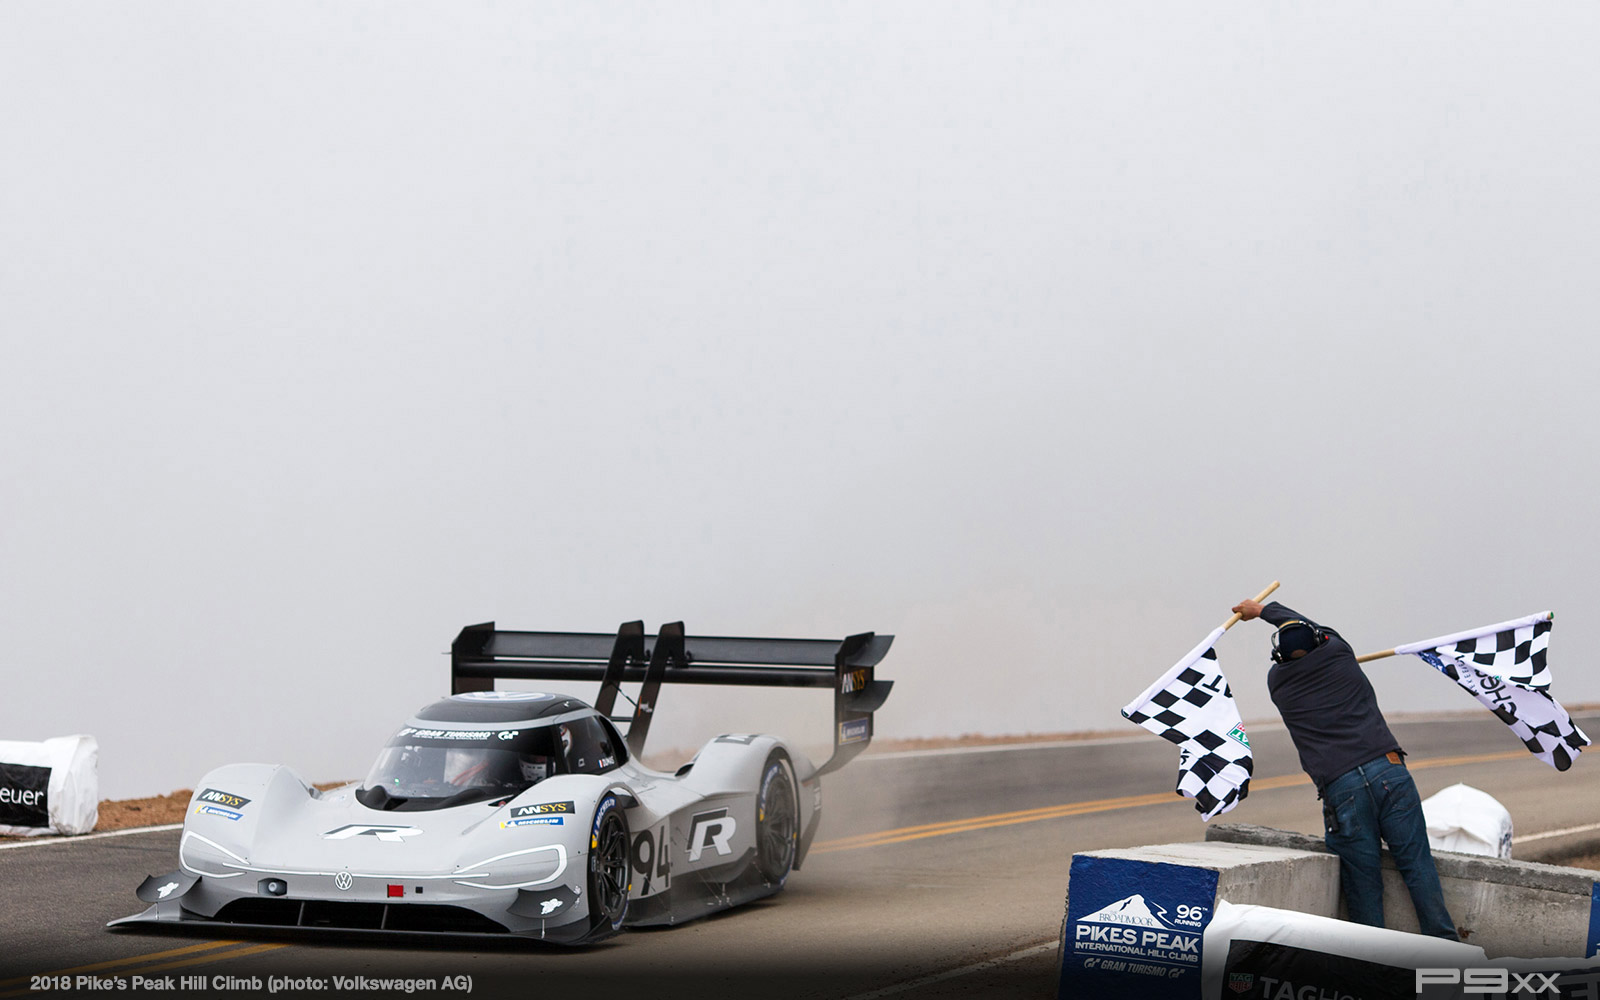 2018-Pikes-Peak-Volkswagen-IDR-296